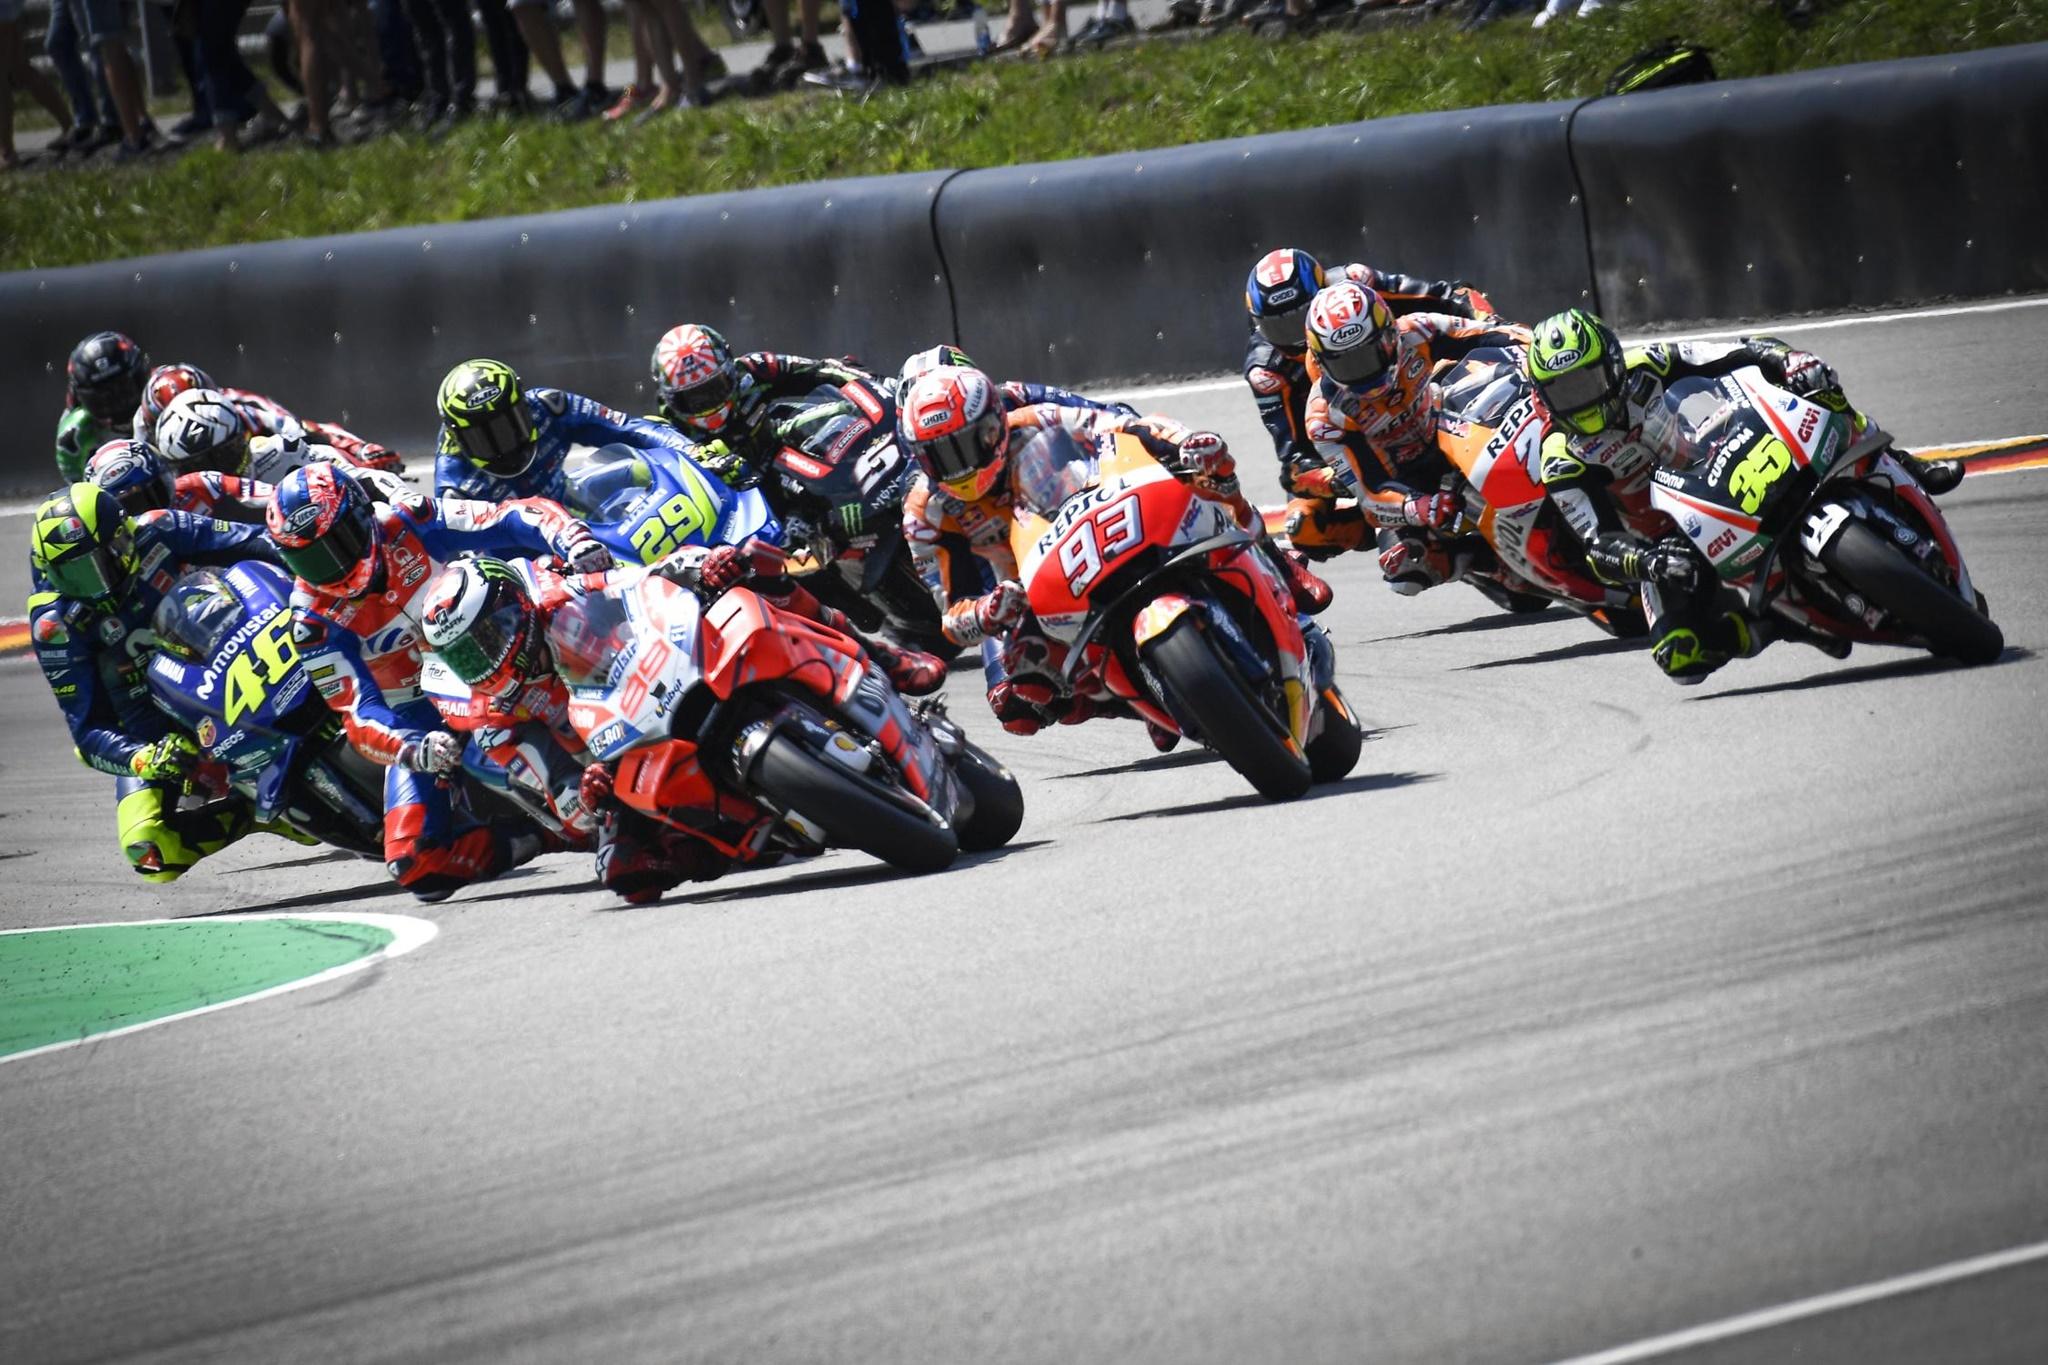 MotoGP18_GermanGP_2018_Xe_Tinhte-007.jpg